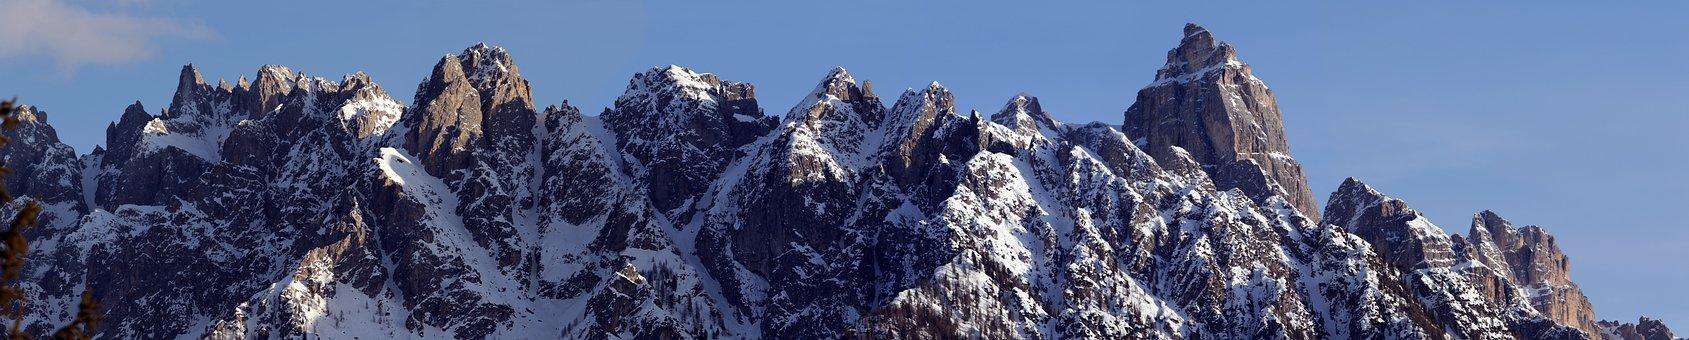 Haunold Massif, South Tyrol